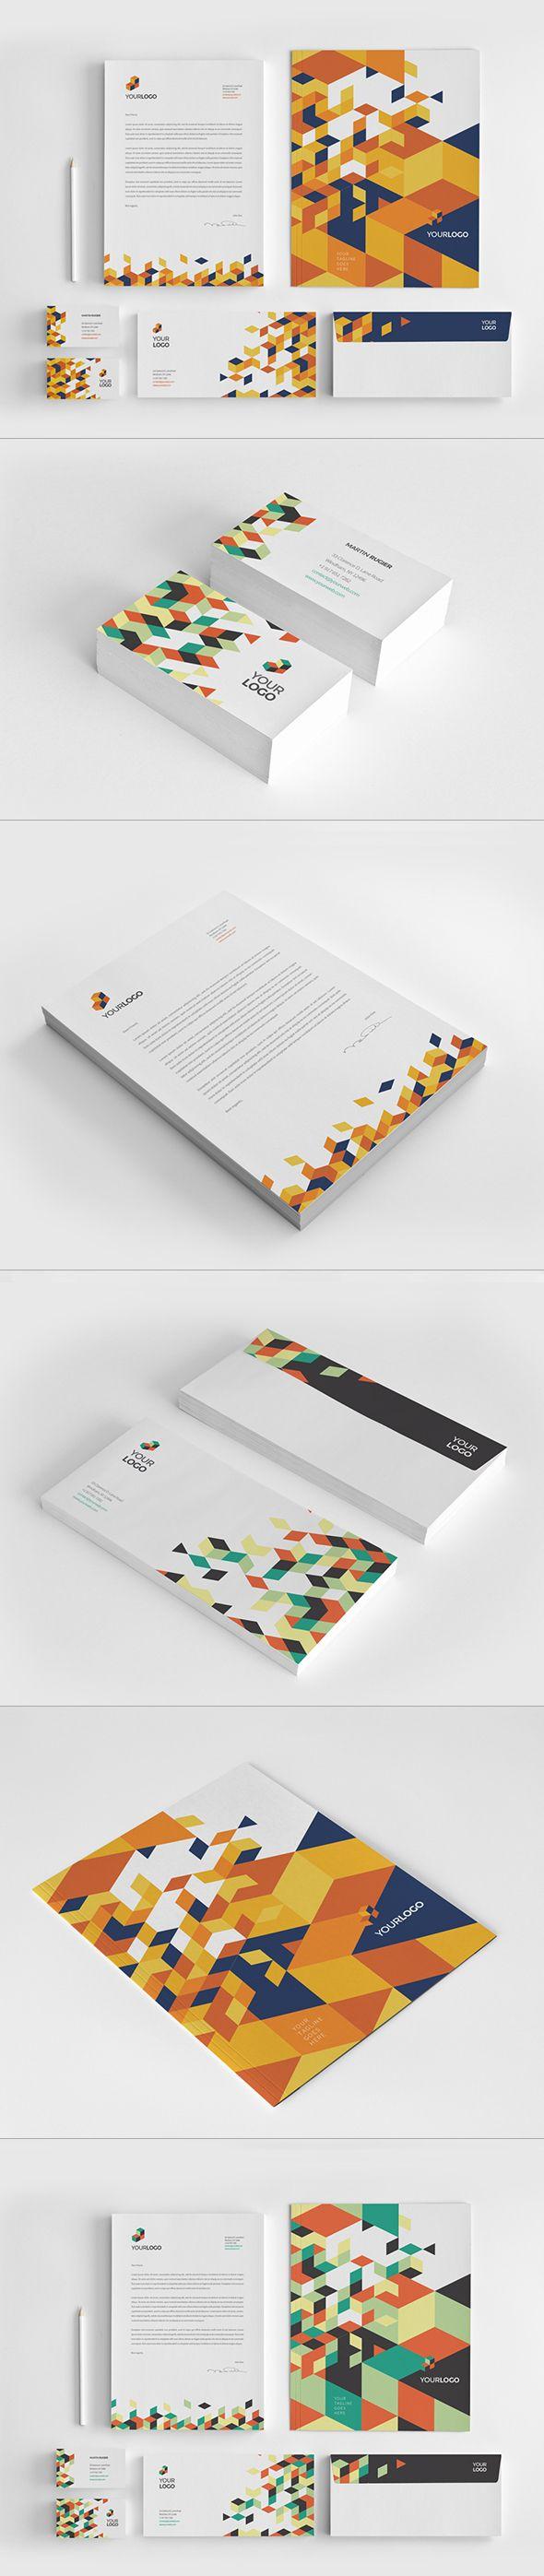 Ampoule laureen luhn design graphique - Square Orange Pattern Stationery By Abra Design Via Behance